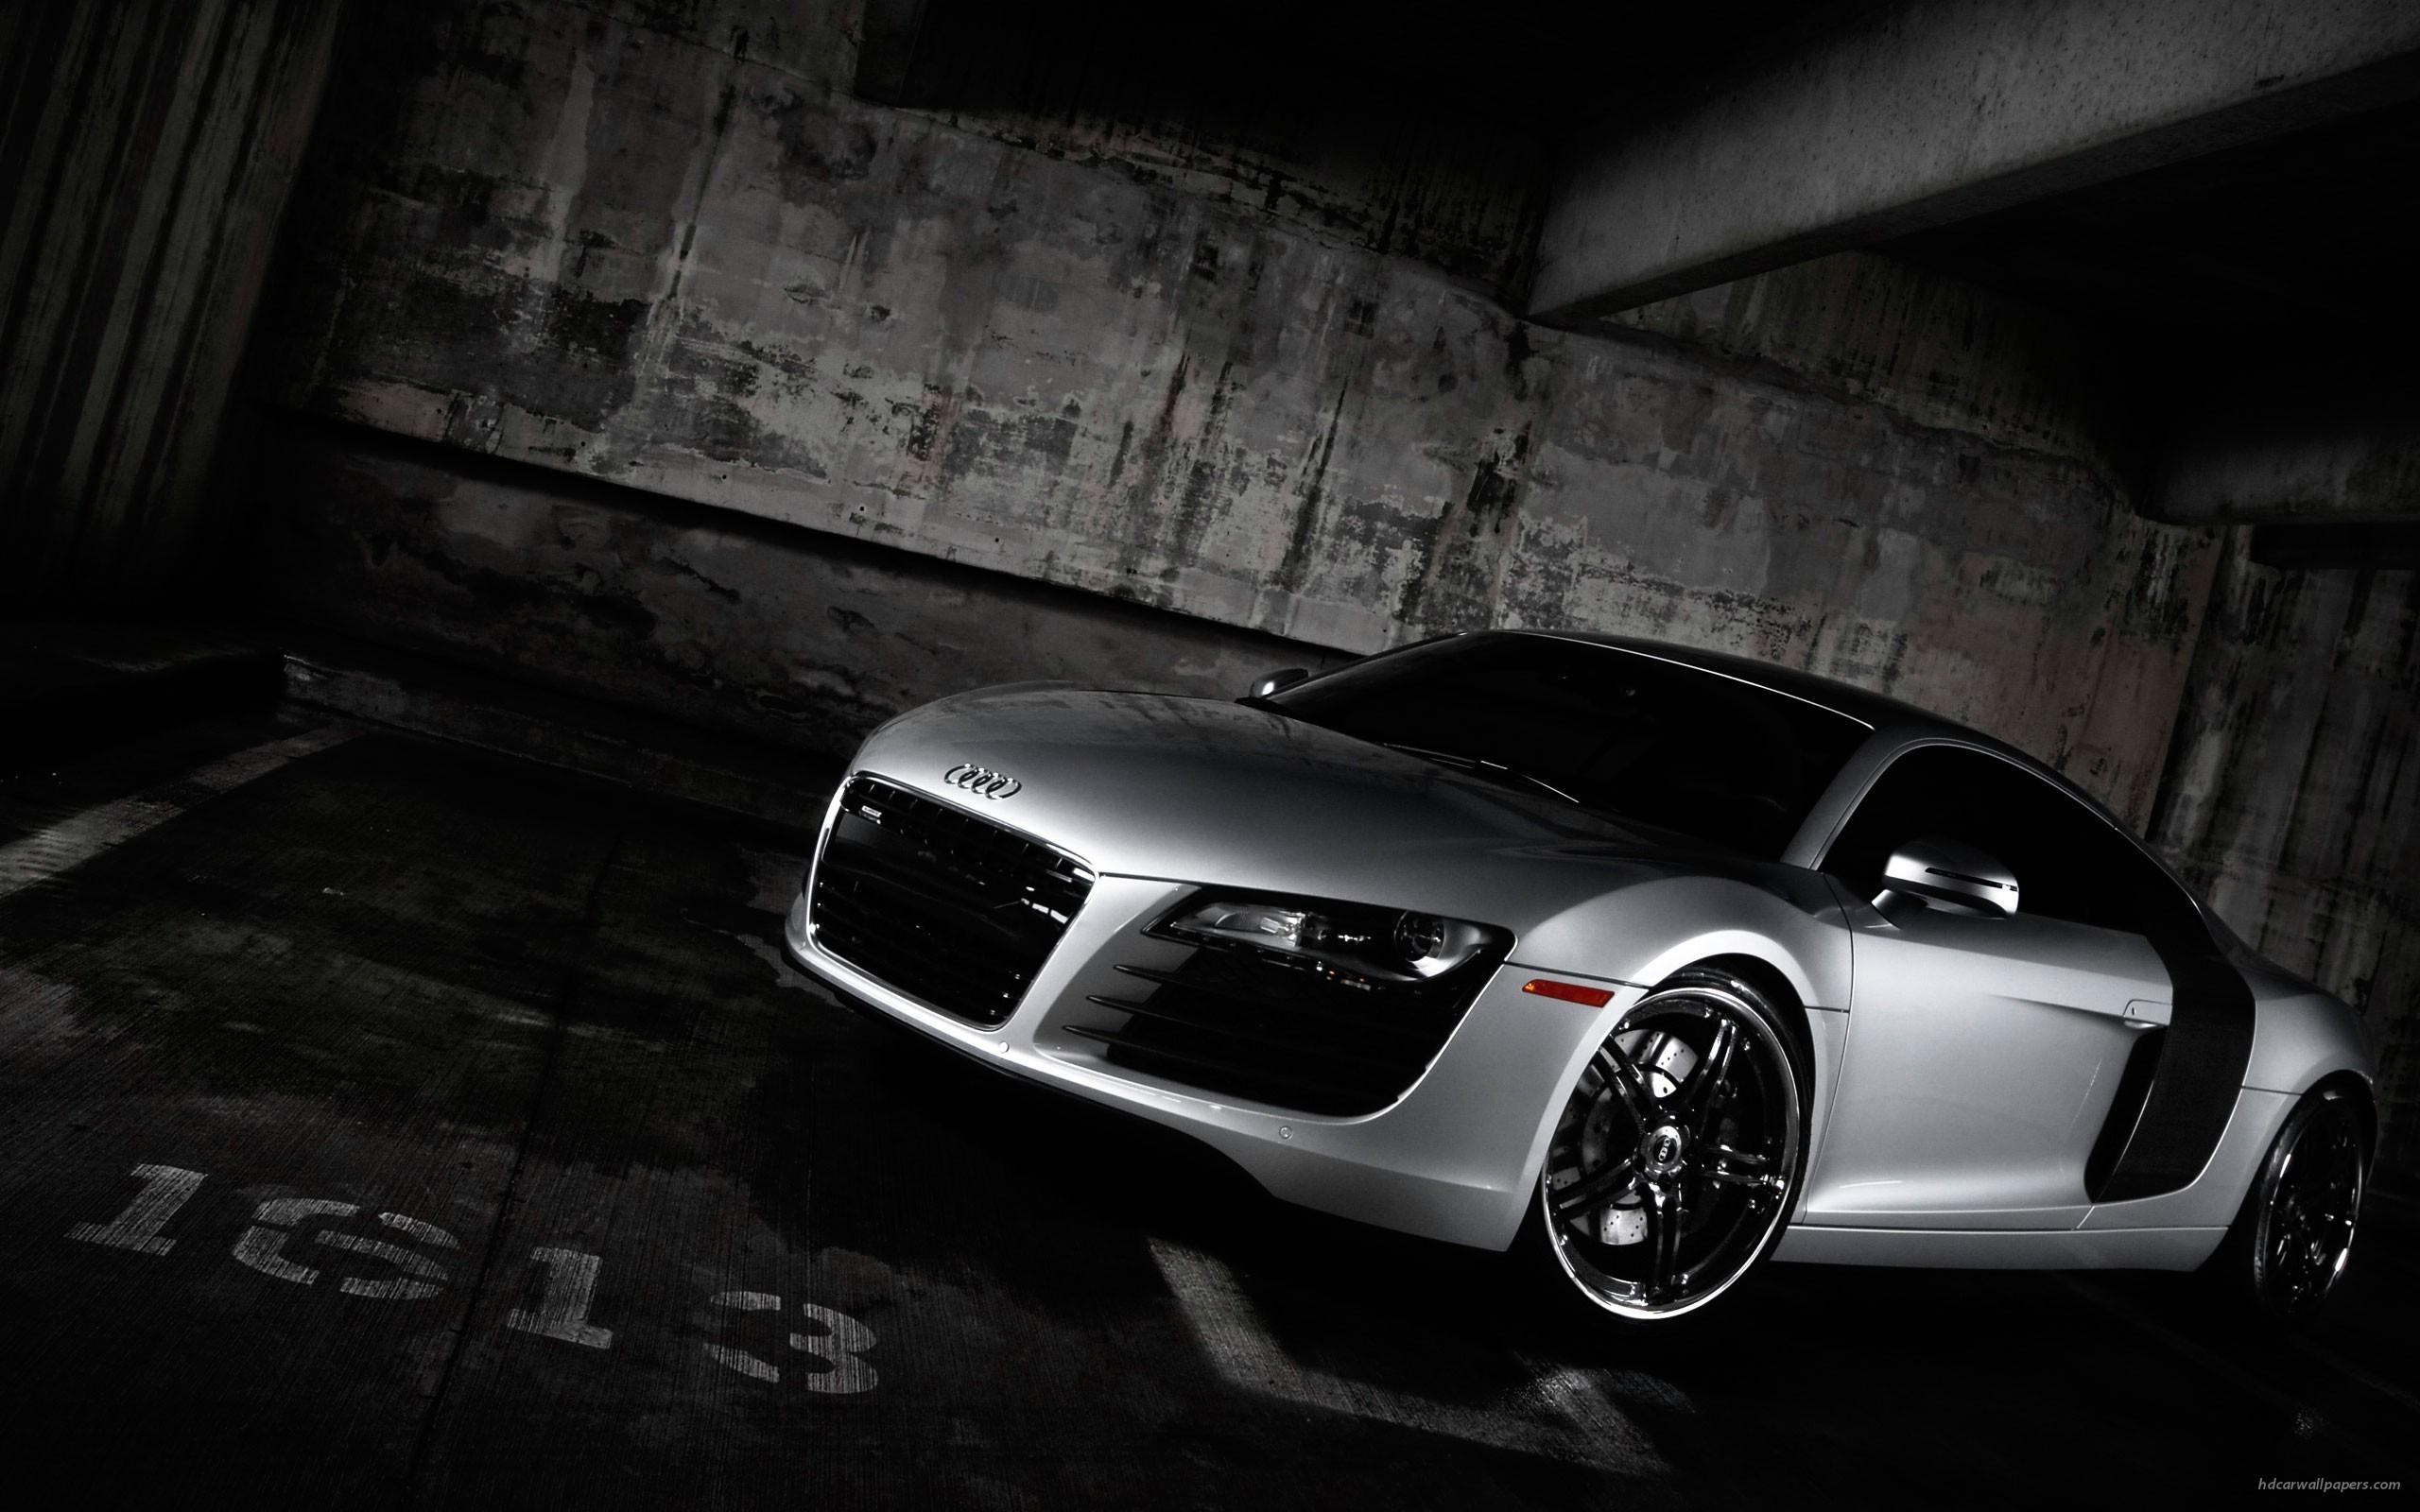 Audi R8 Exclusive HD Wallpaper for Desktop Backgrounds 2560x1600